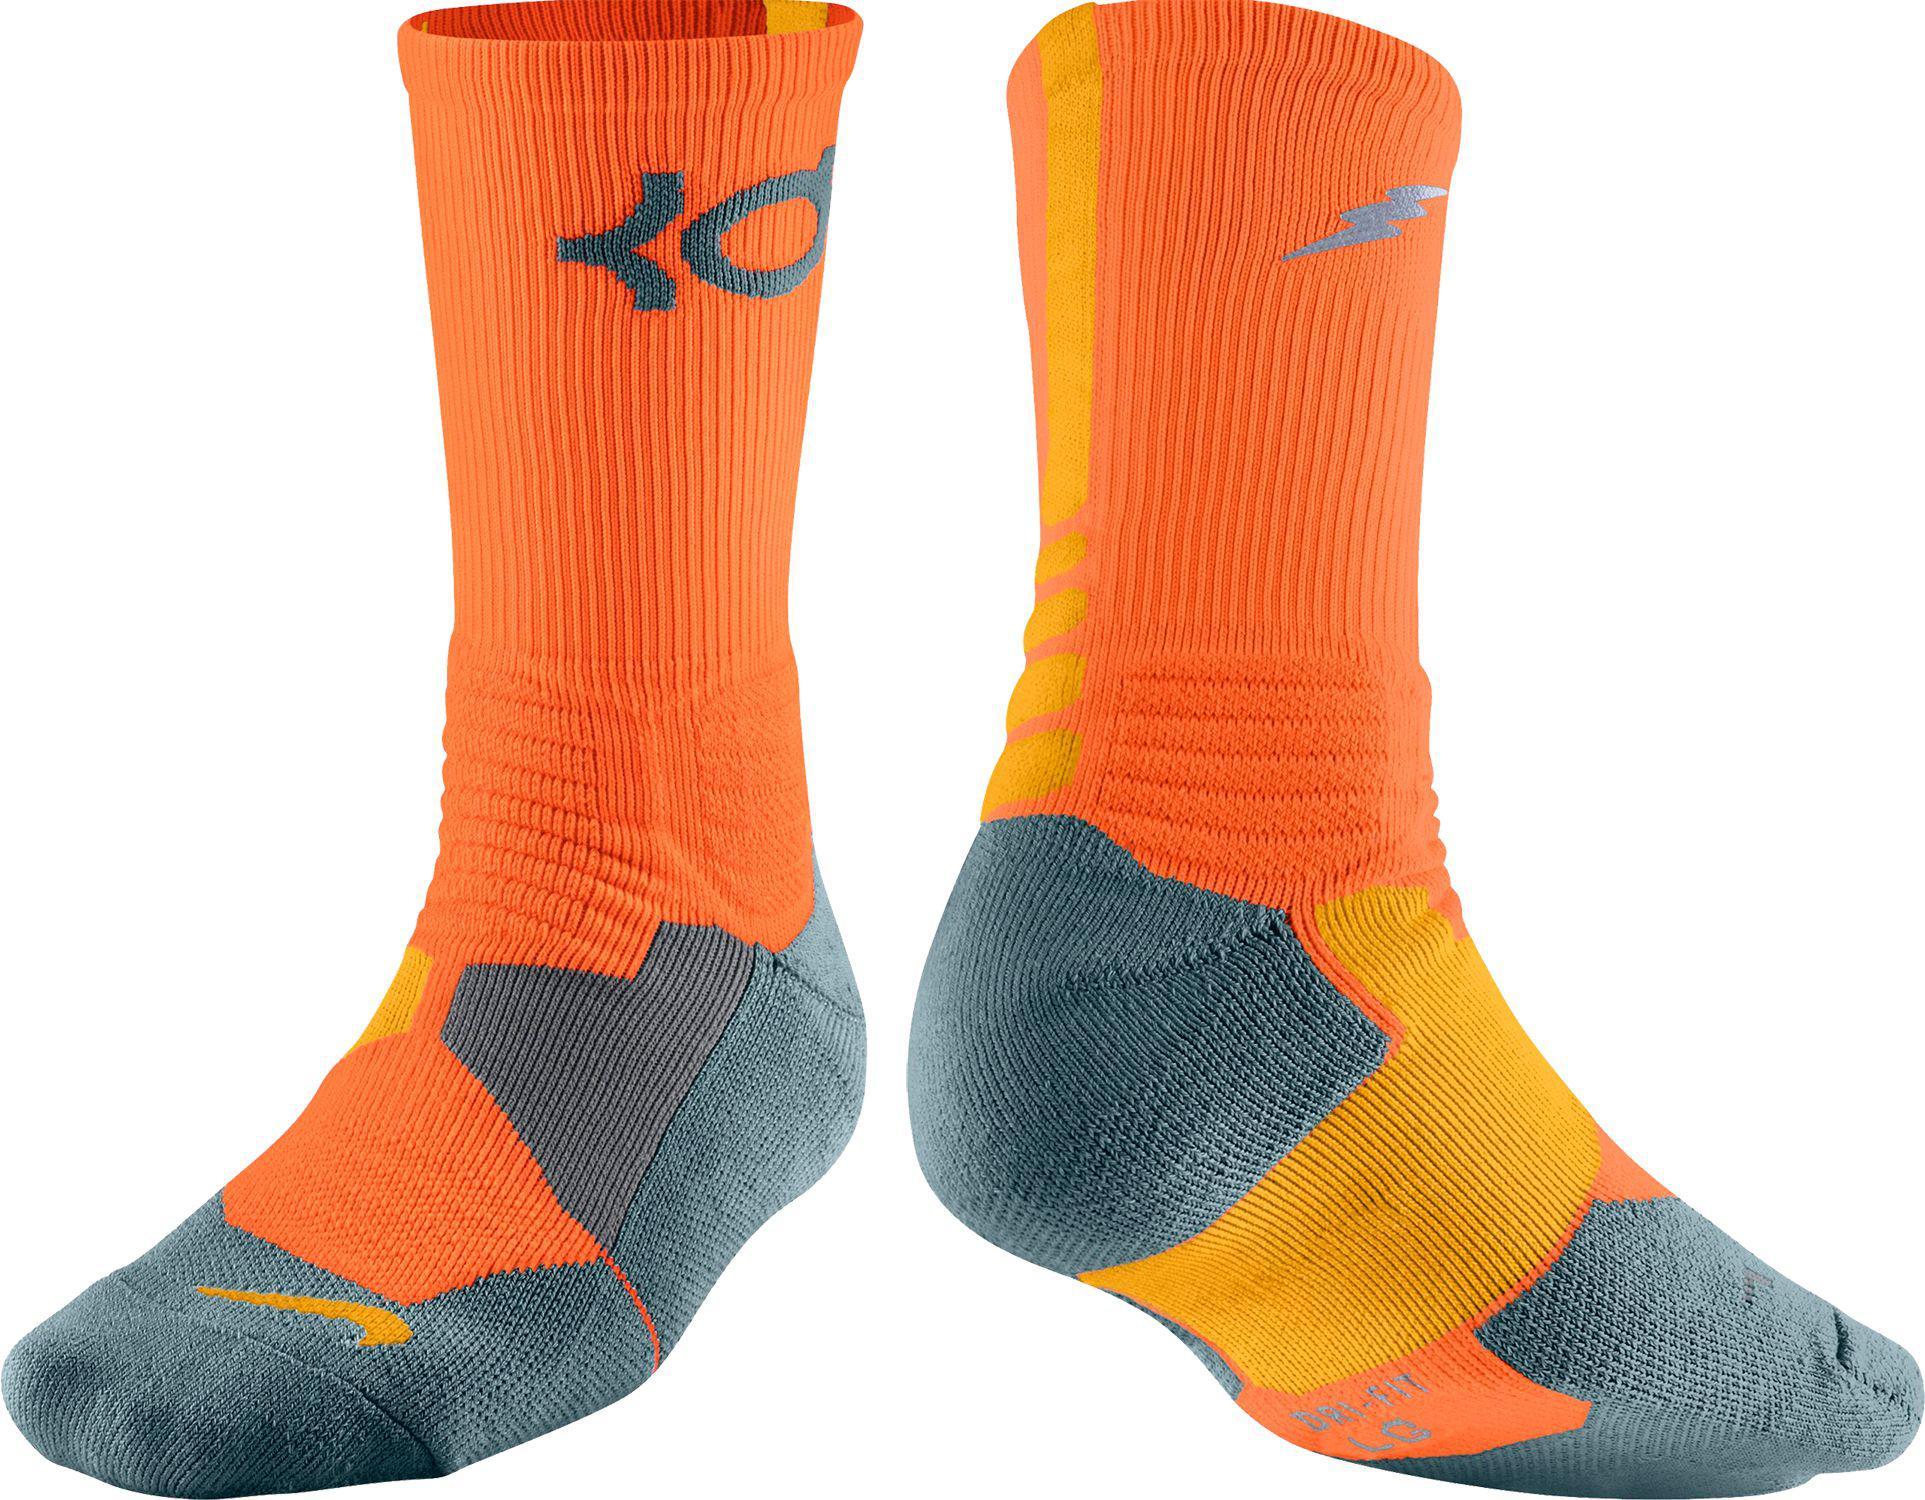 cefbfd79f741 Lyst - Nike Kd Hyper Elite Crew Basketball Socks in Orange for Men